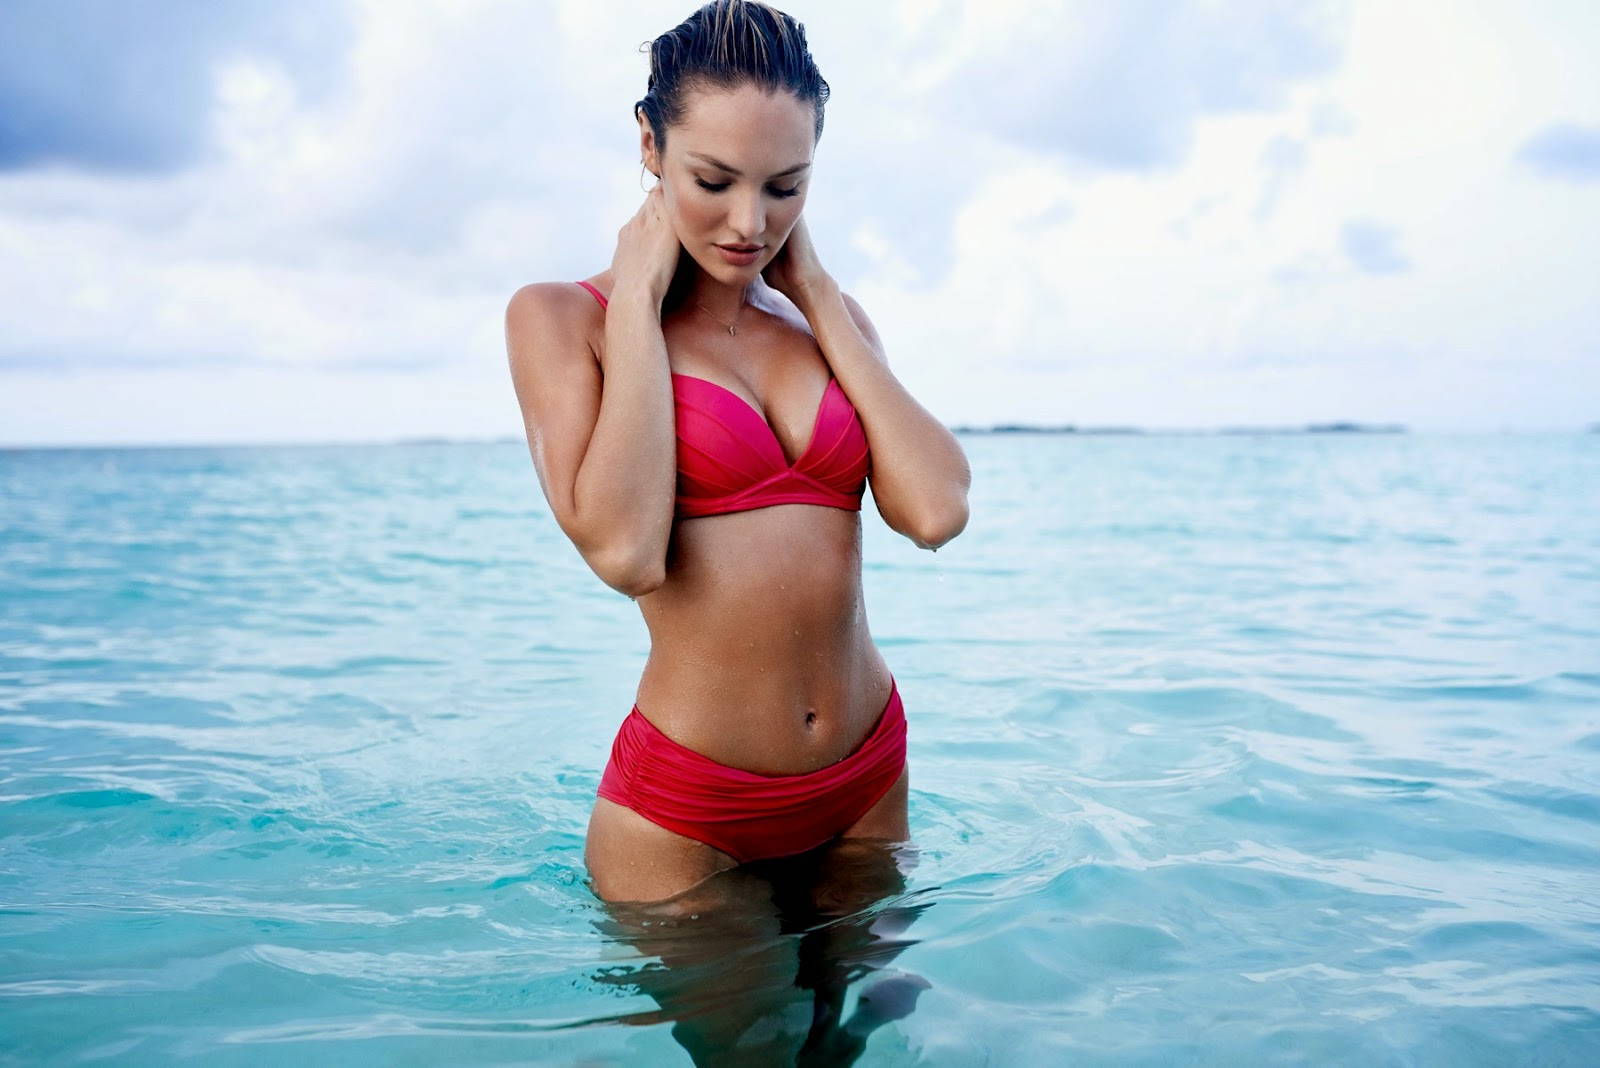 Candice-Swanepoel-Paola-Murray-Swimwear-3.jpg